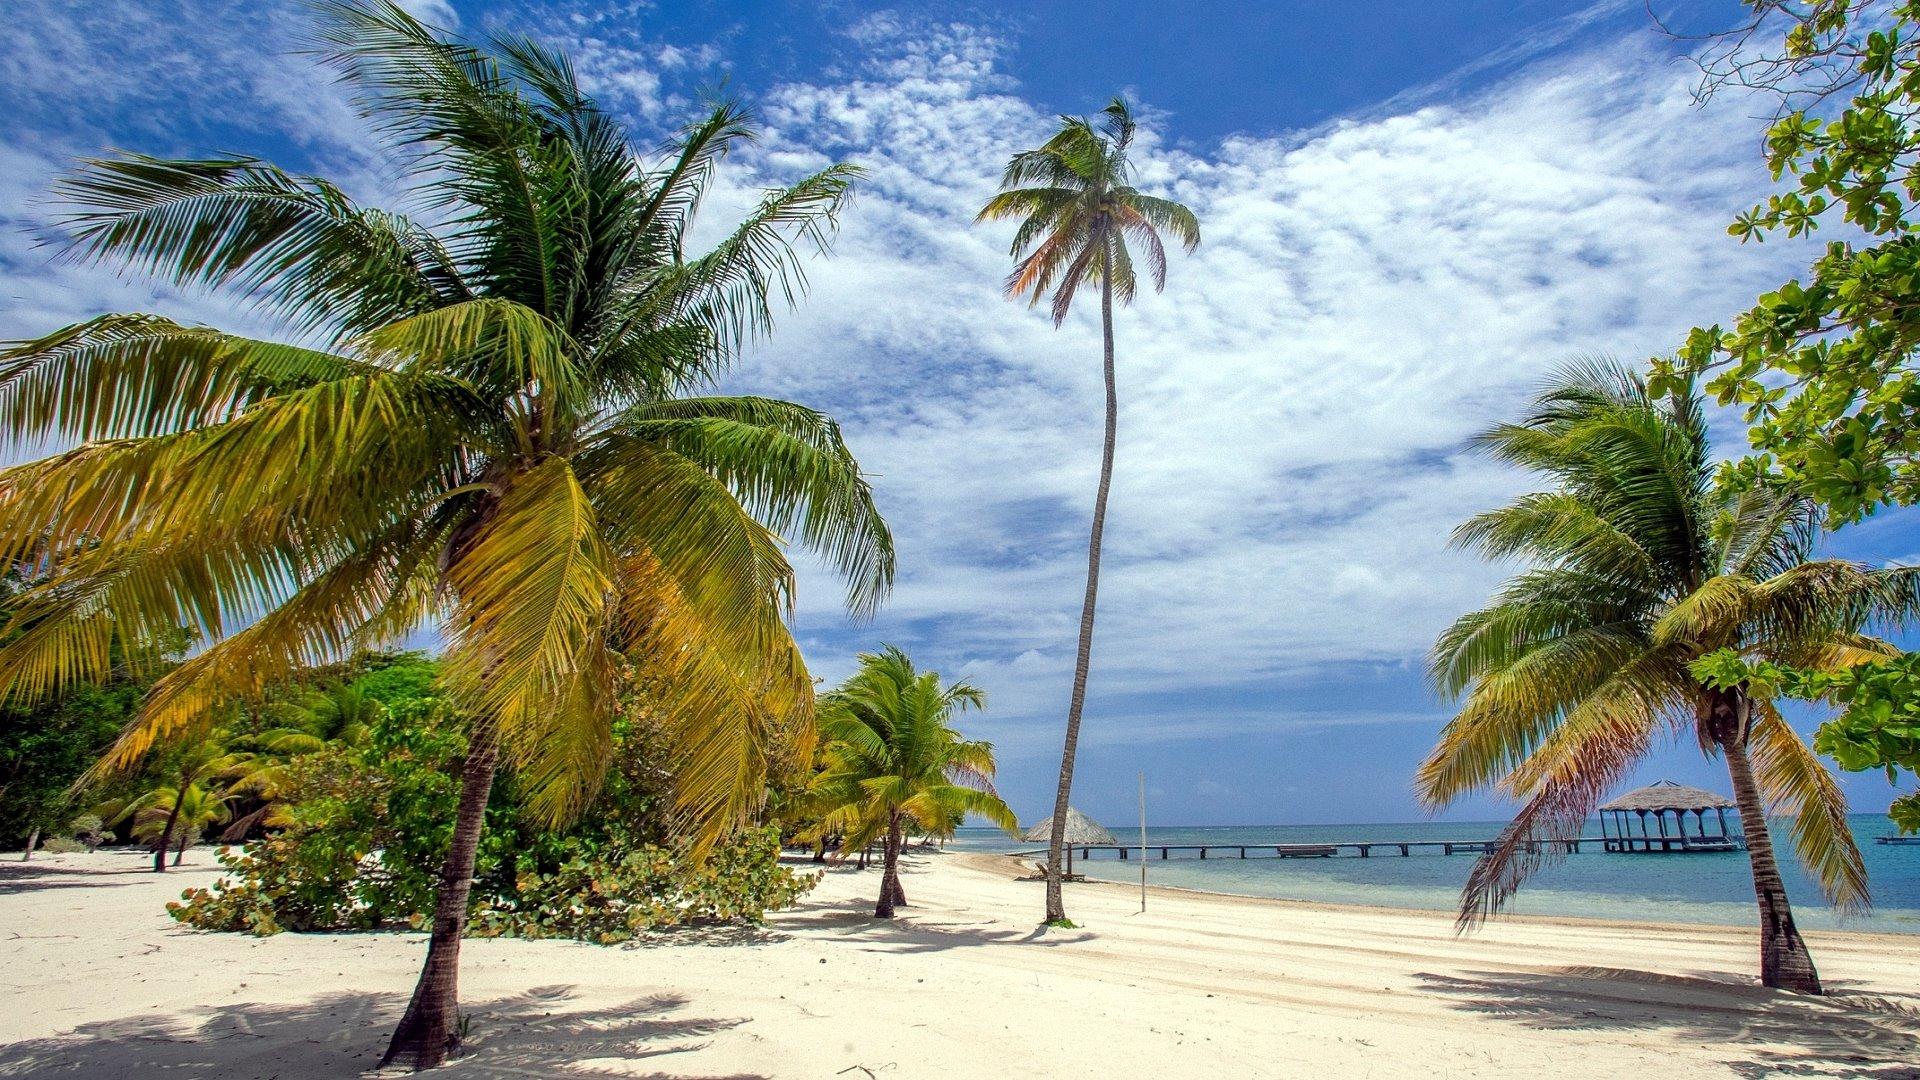 Bilder Palmenstrand Karibik